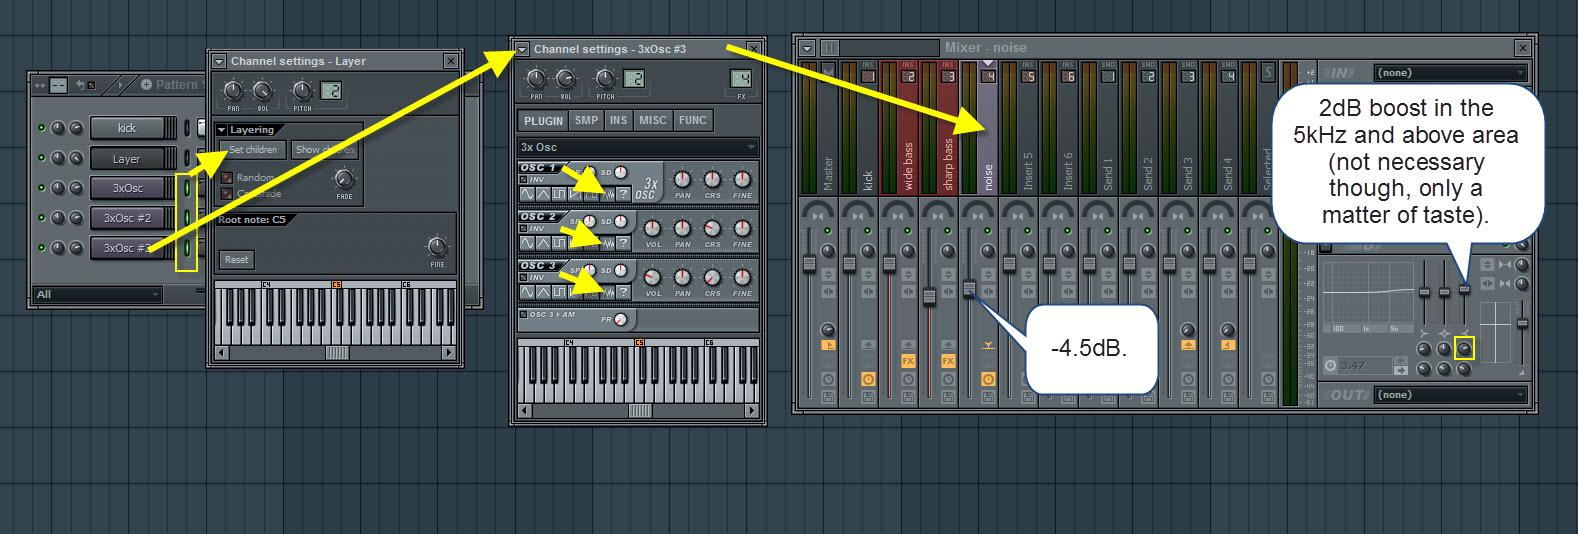 Noise 3xOsc And Mixer Settings